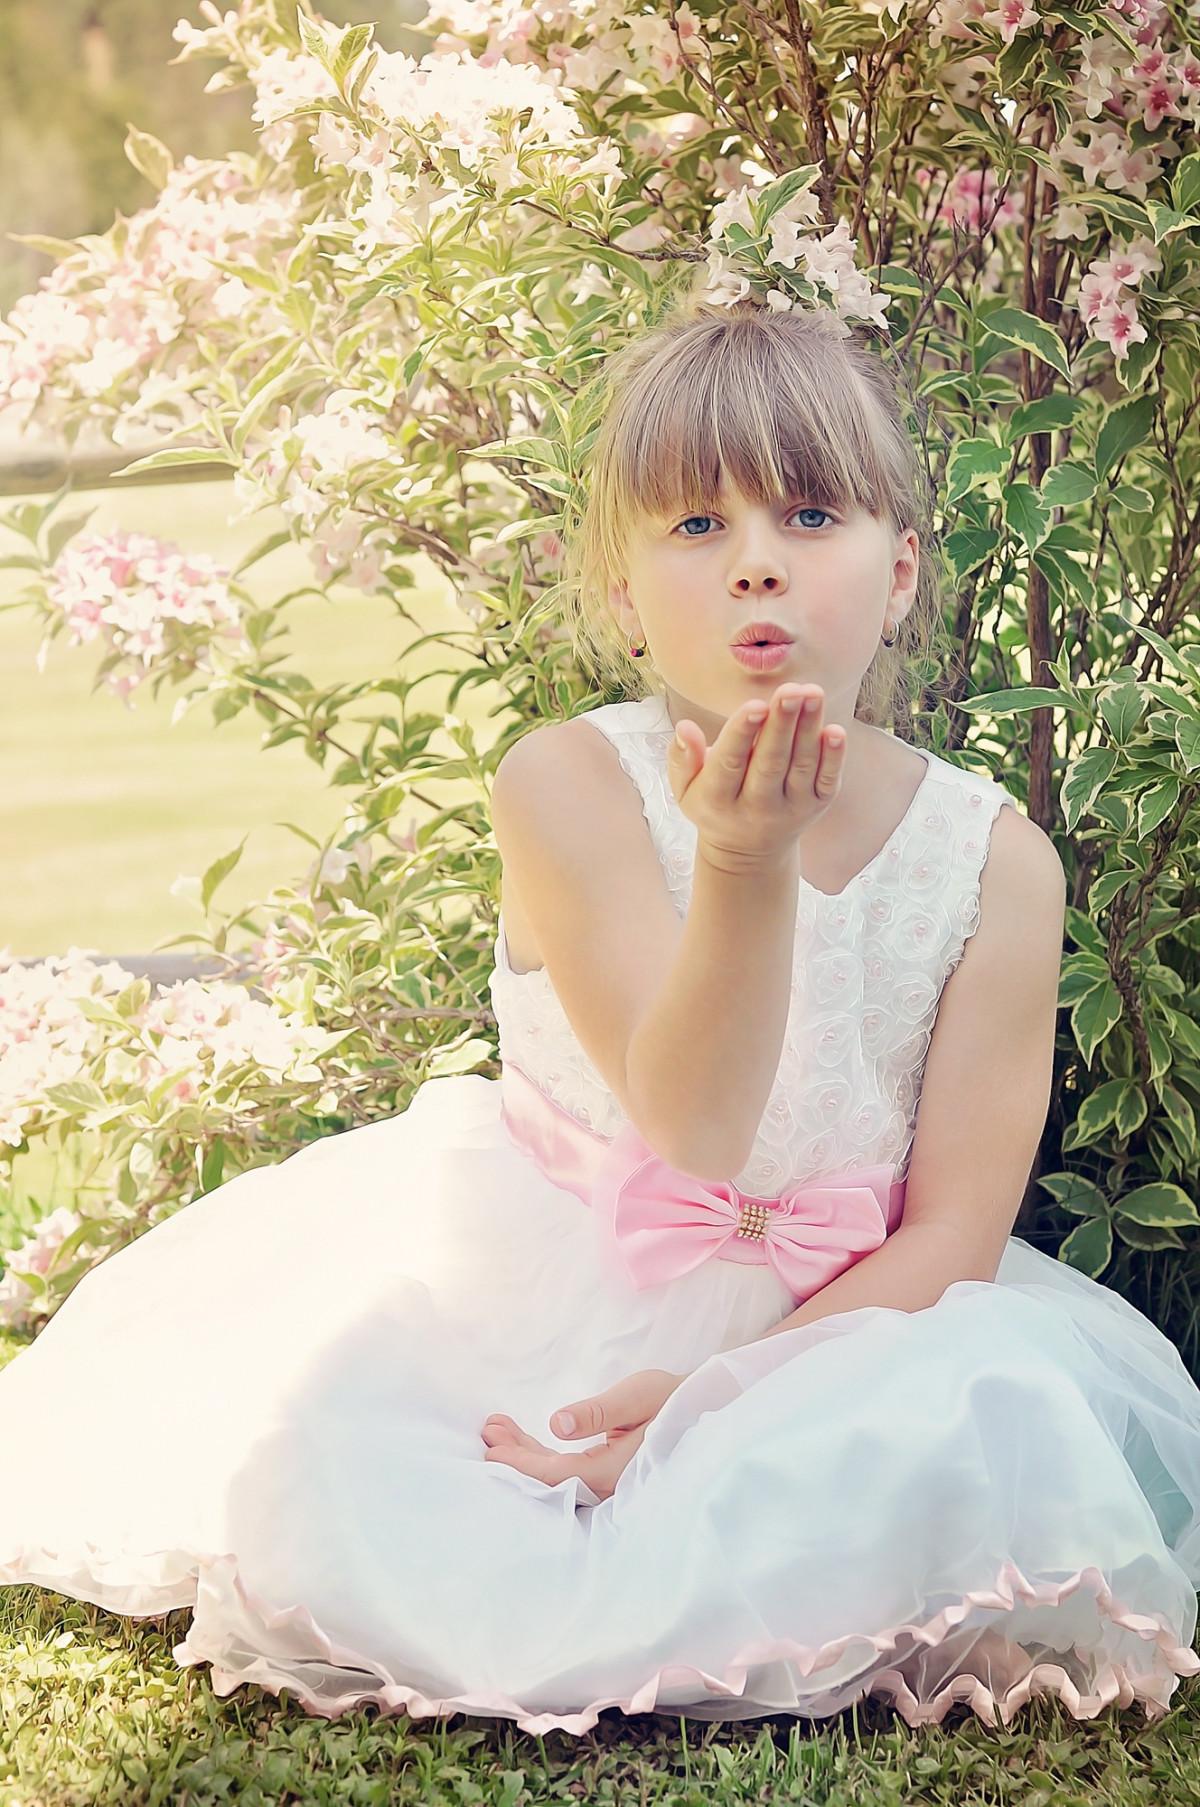 Free Images  girl child clothing childhood toddler